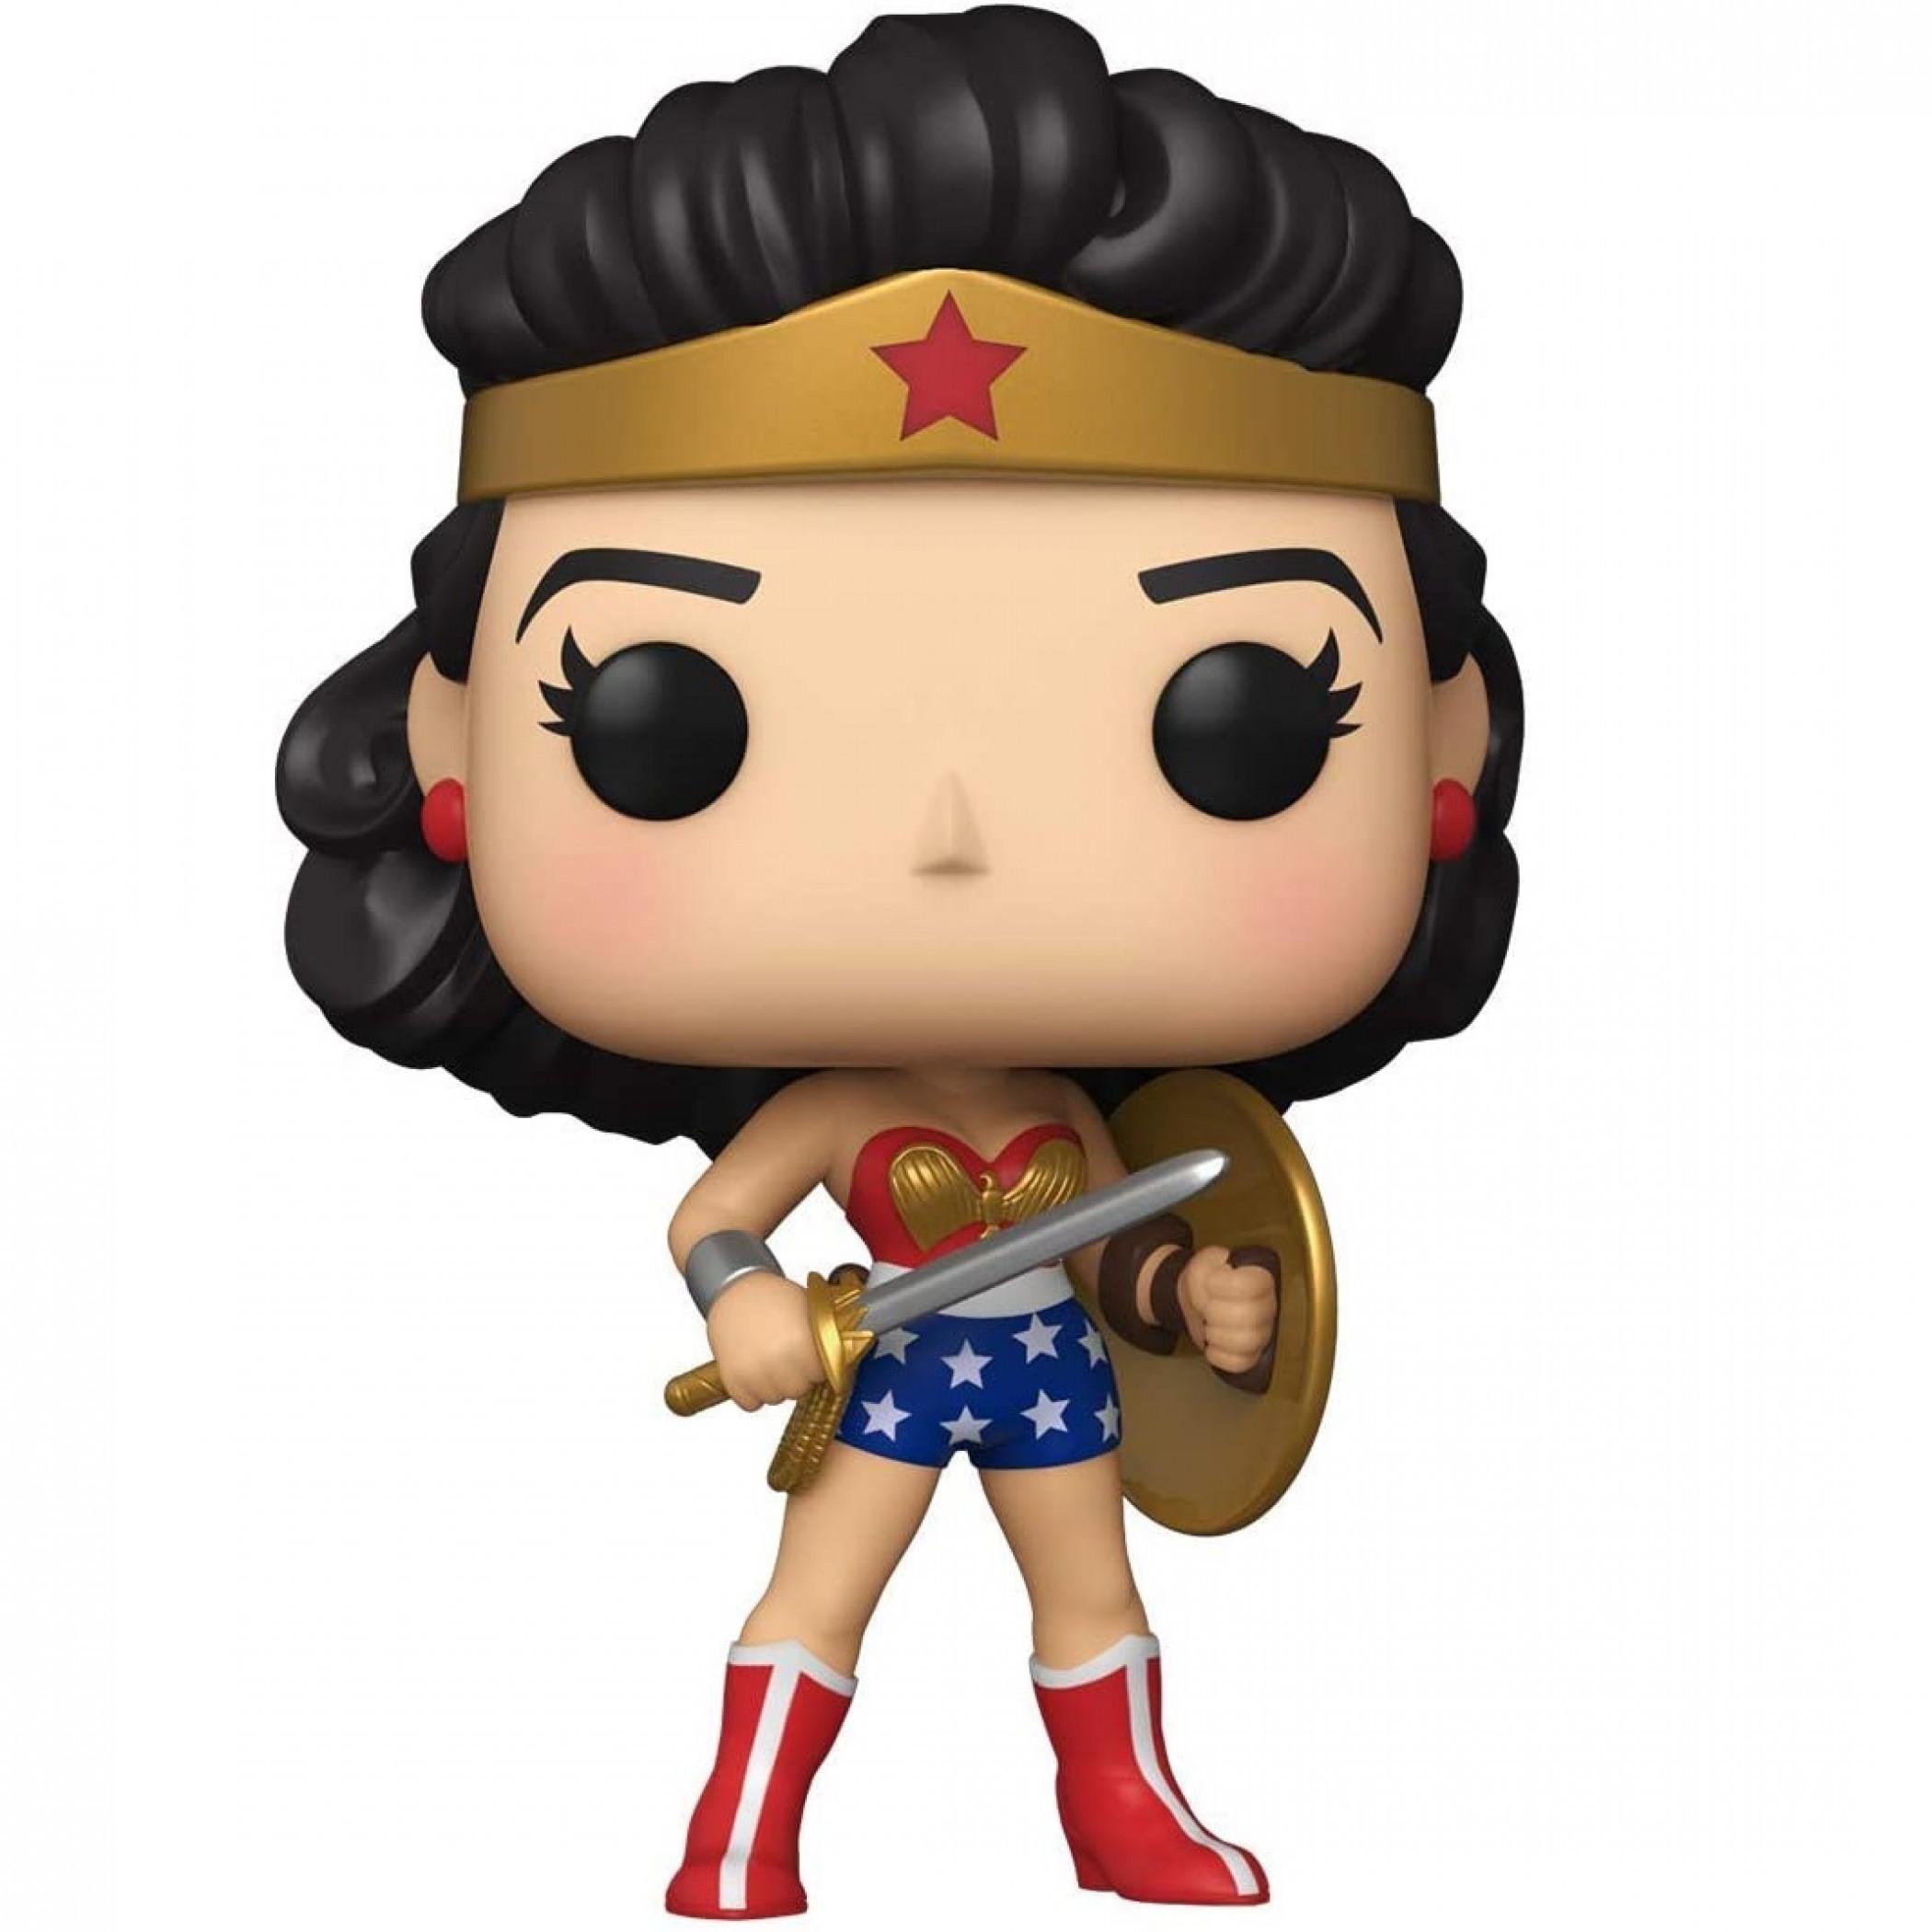 Wonder Woman Golden Age 80th Anniversary Funko Pop!